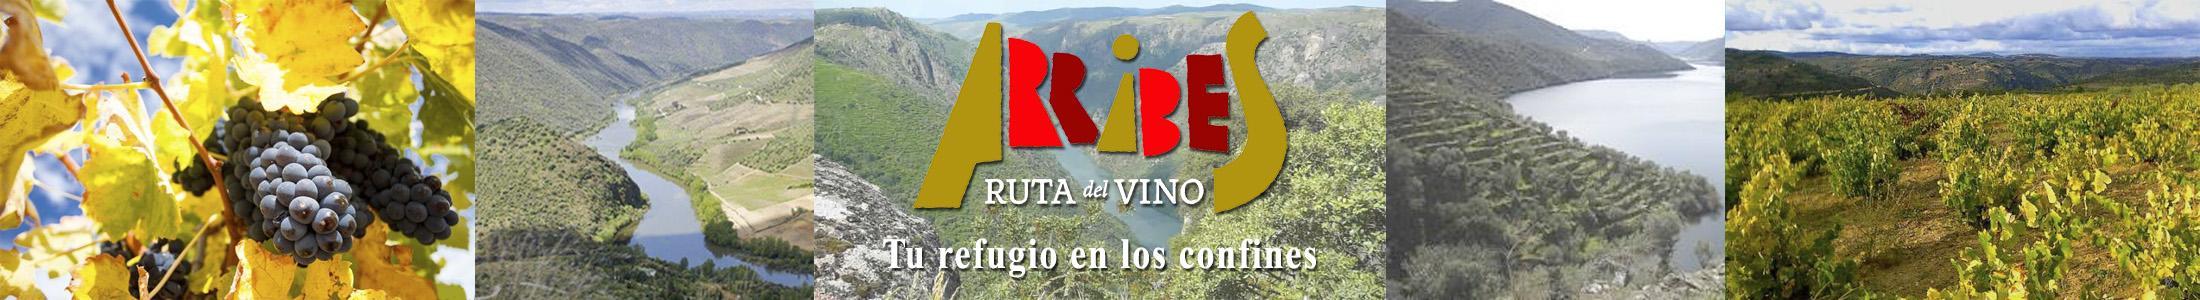 Banner horizontal Ruta del Vino Arribes